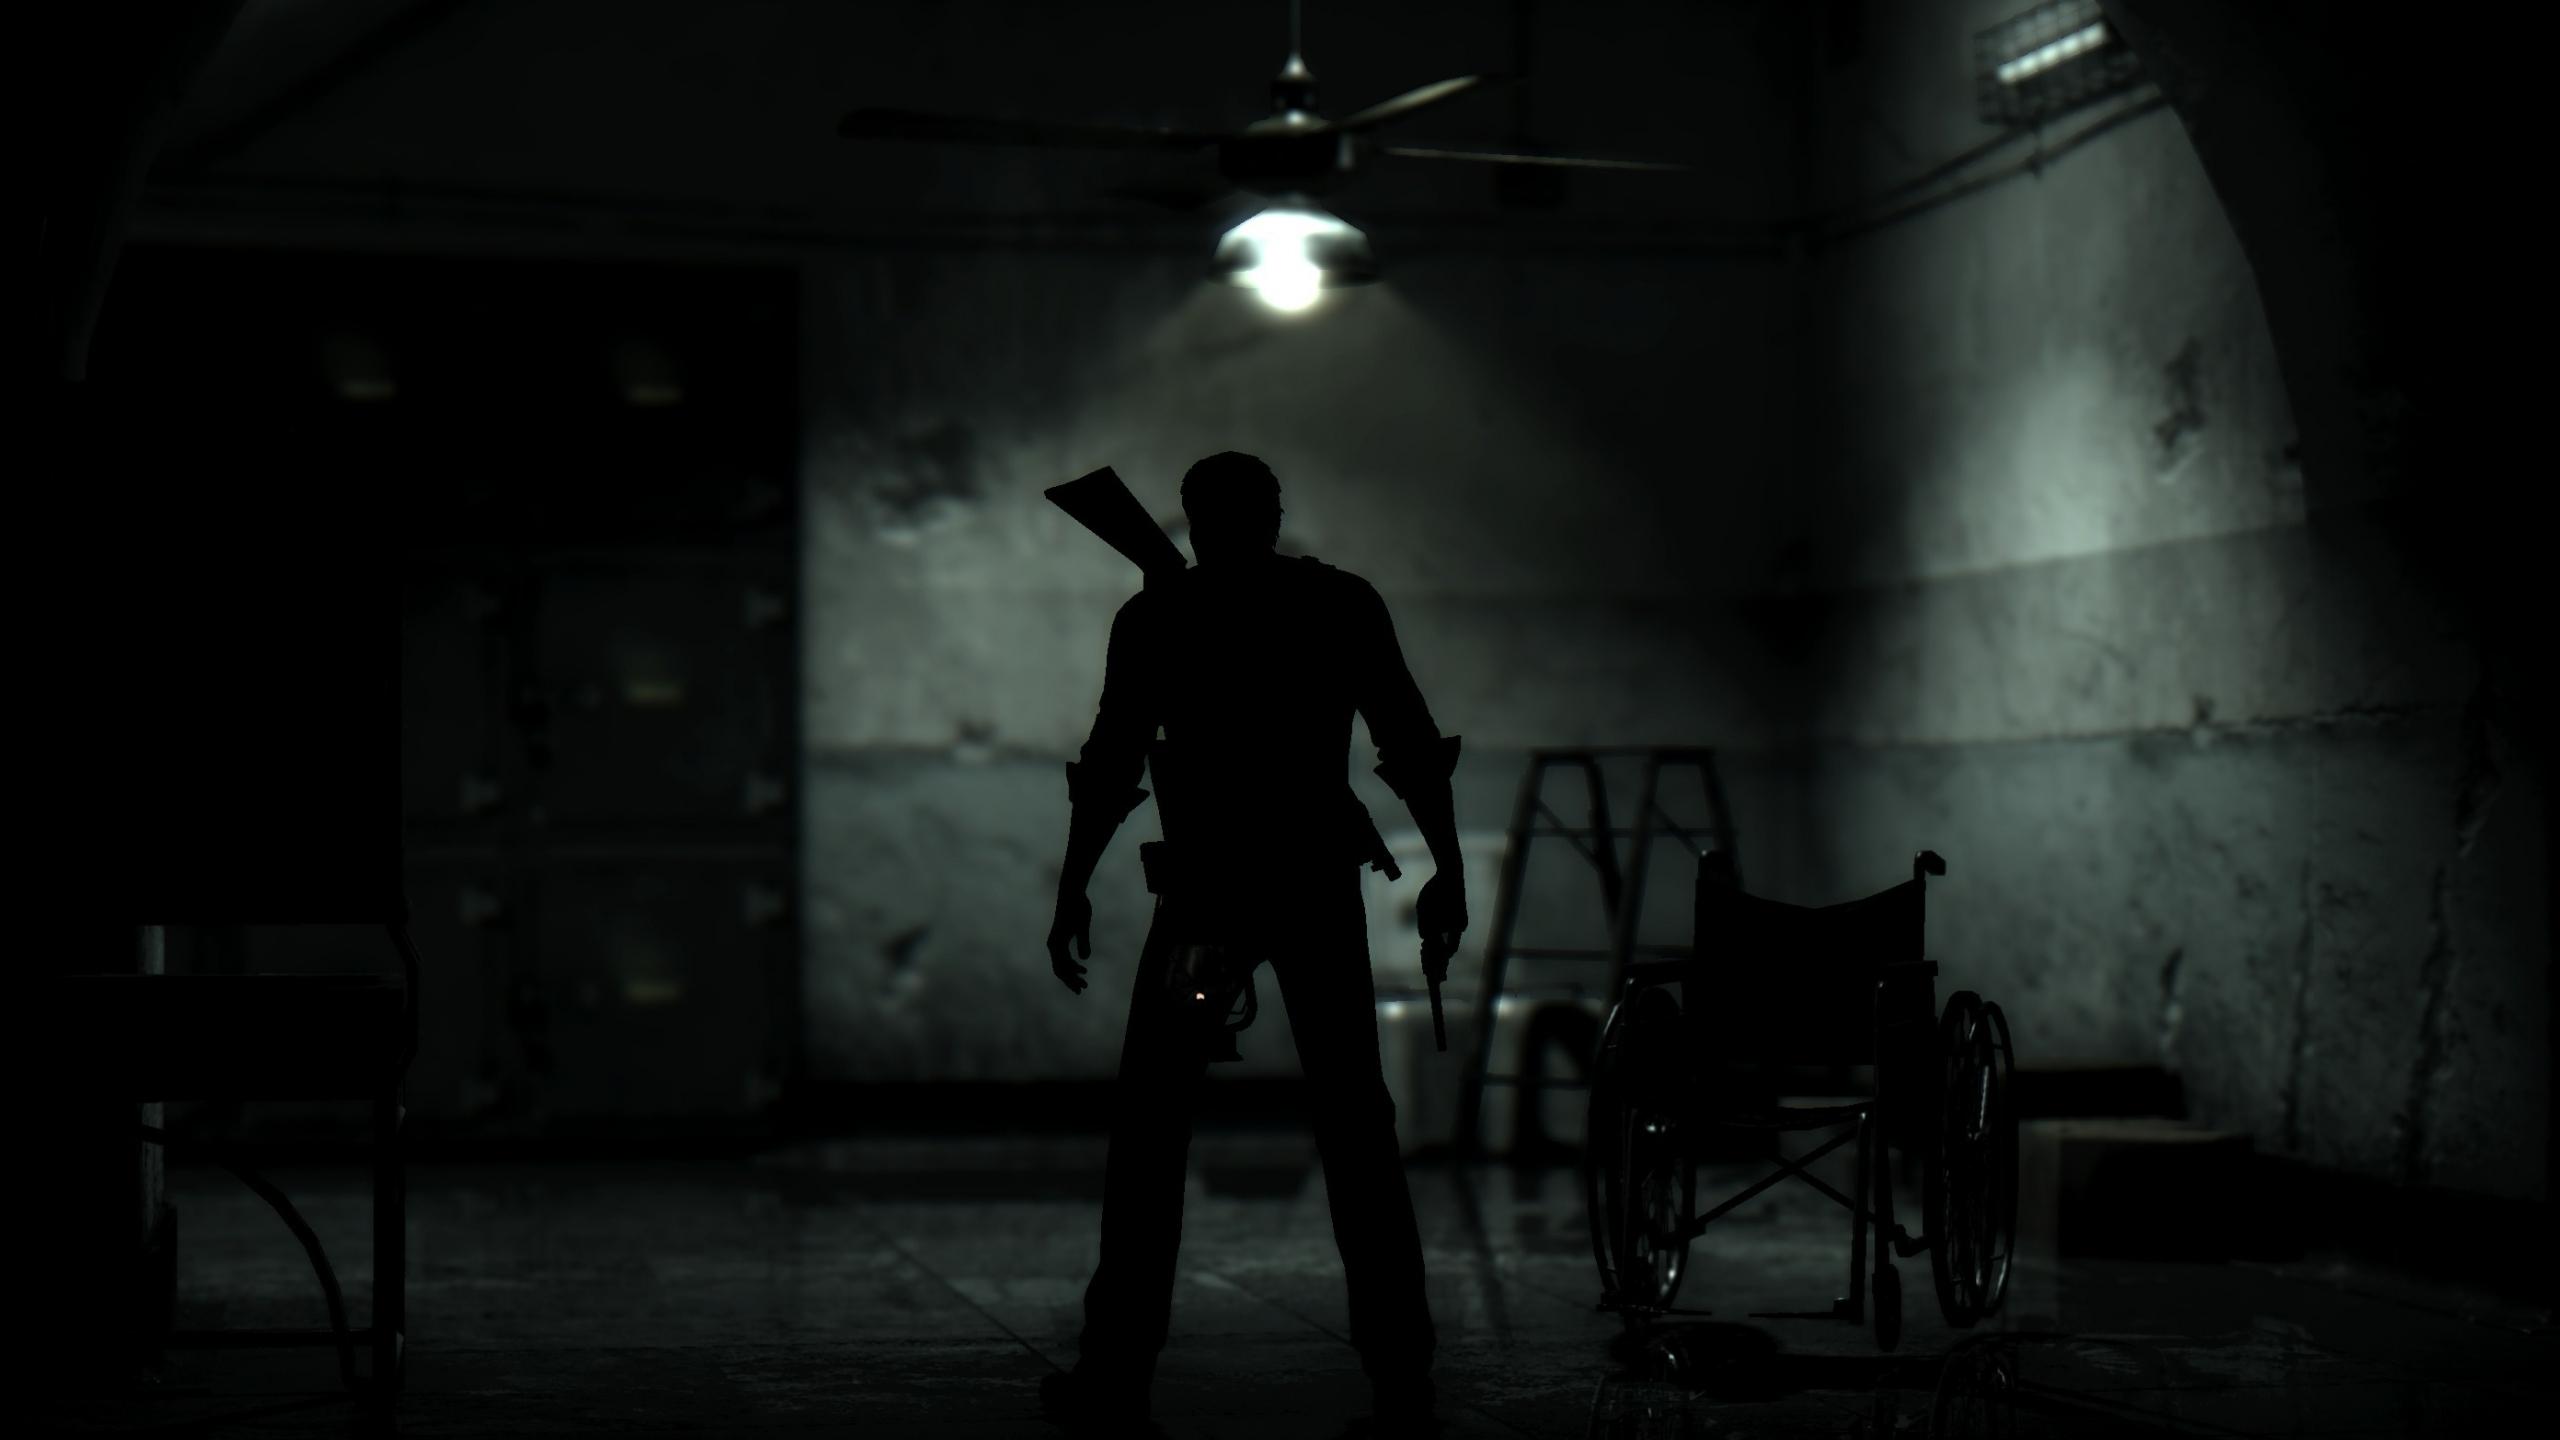 Download 2560x1440 Wallpaper Dark The Evil Within 2 Man With Gun